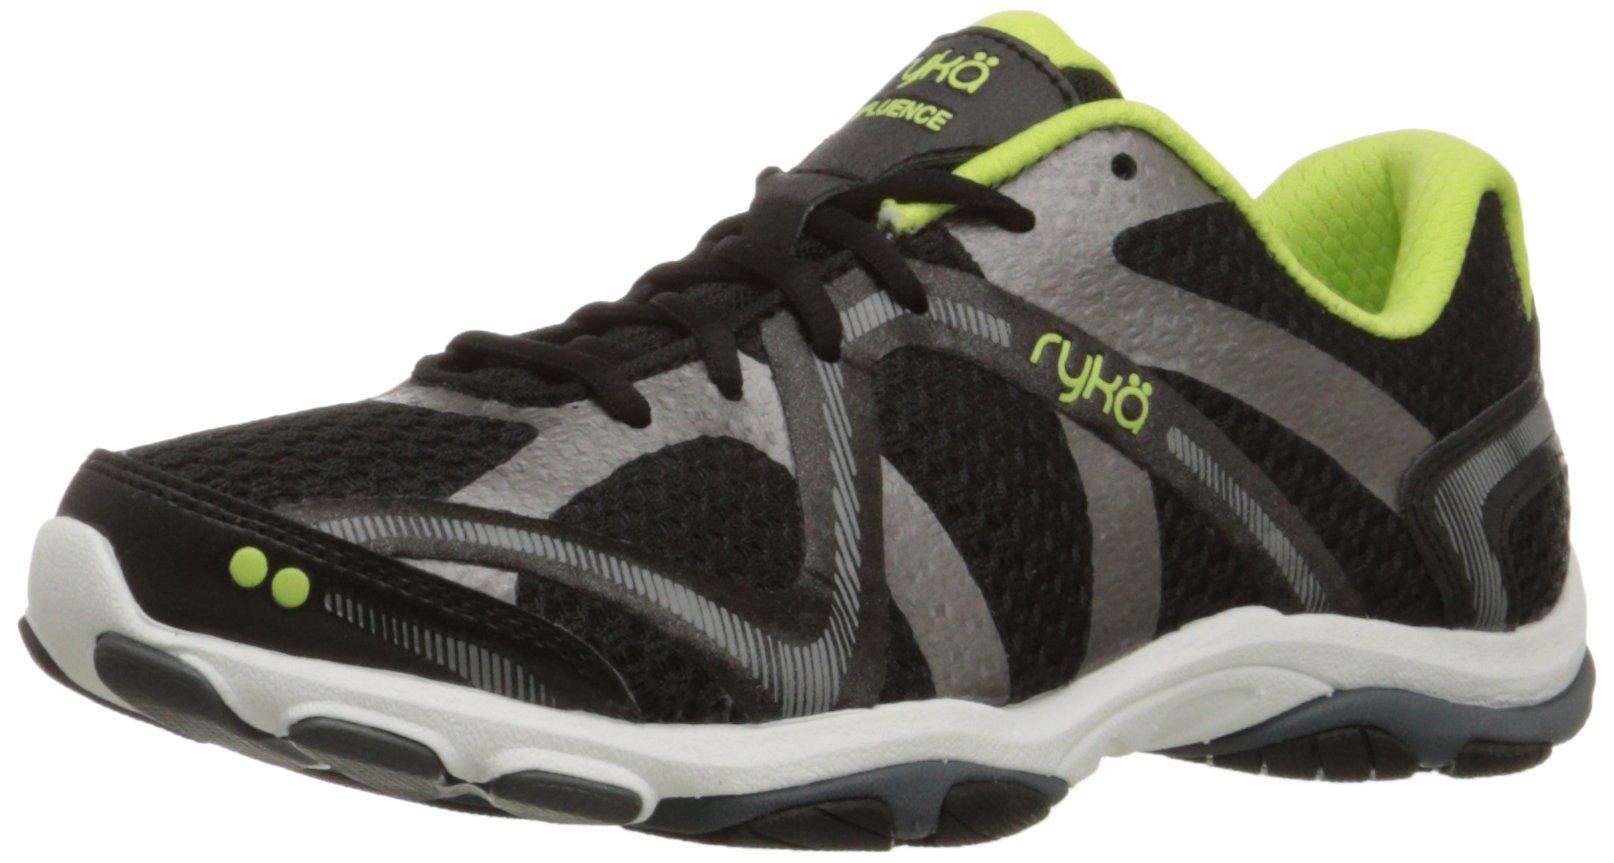 Ryka Women's Influence Cross-Training Shoe, Black/Sharp Green/Forge Grey/Metallic, 9.5 M US